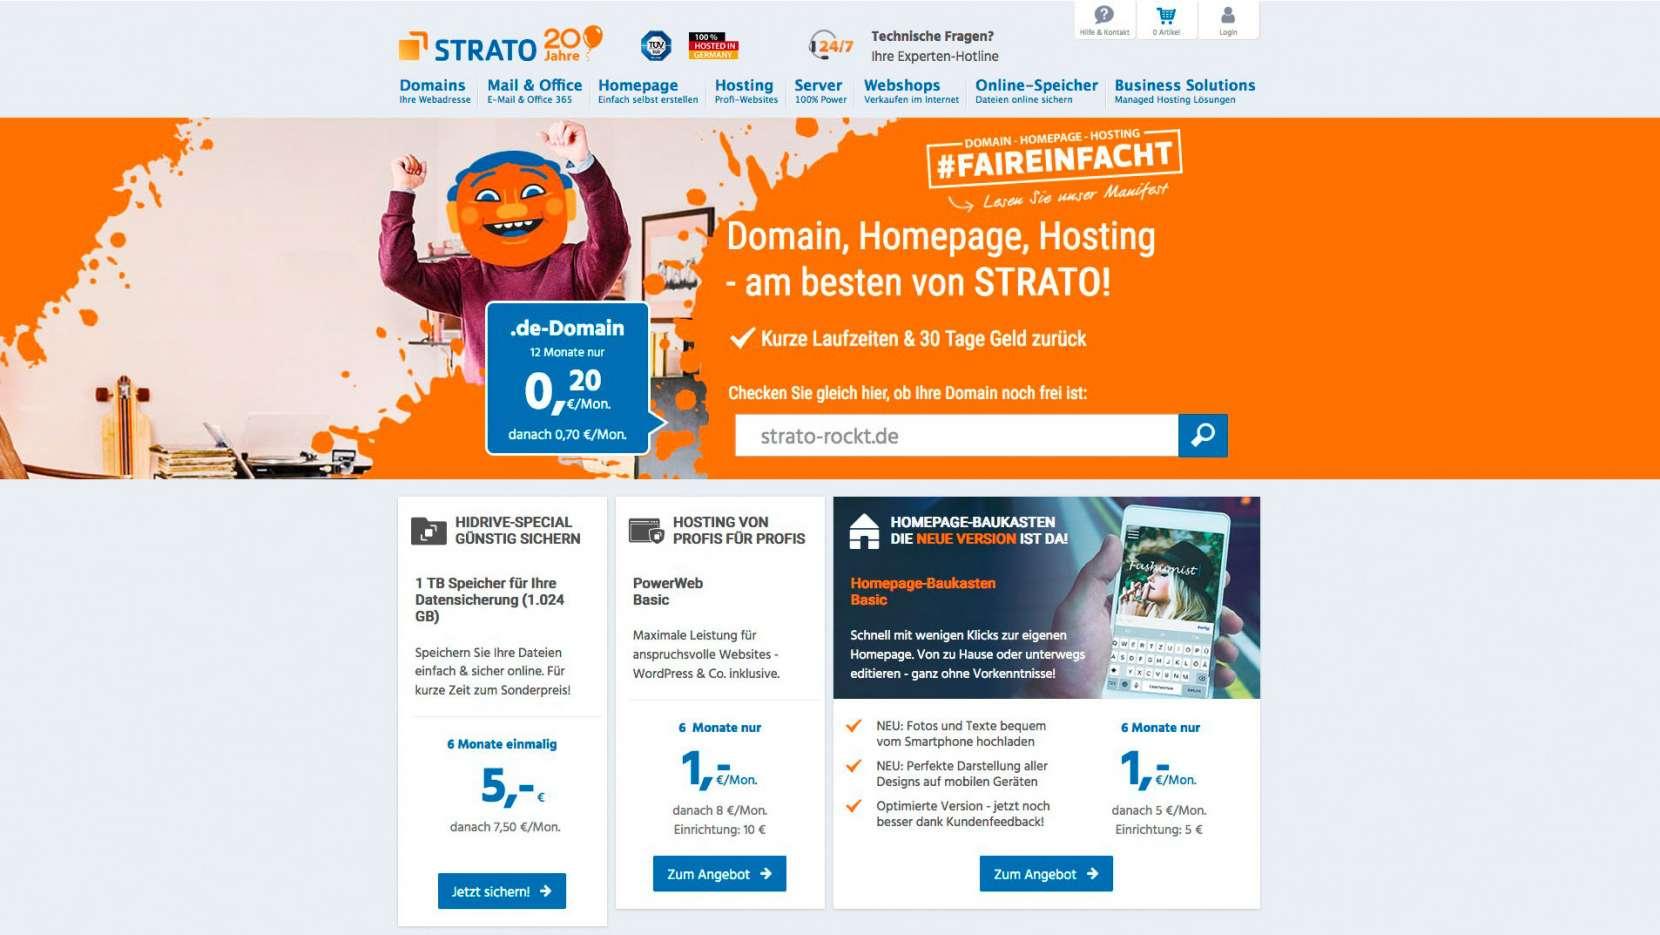 strato-01-1660x935.jpg